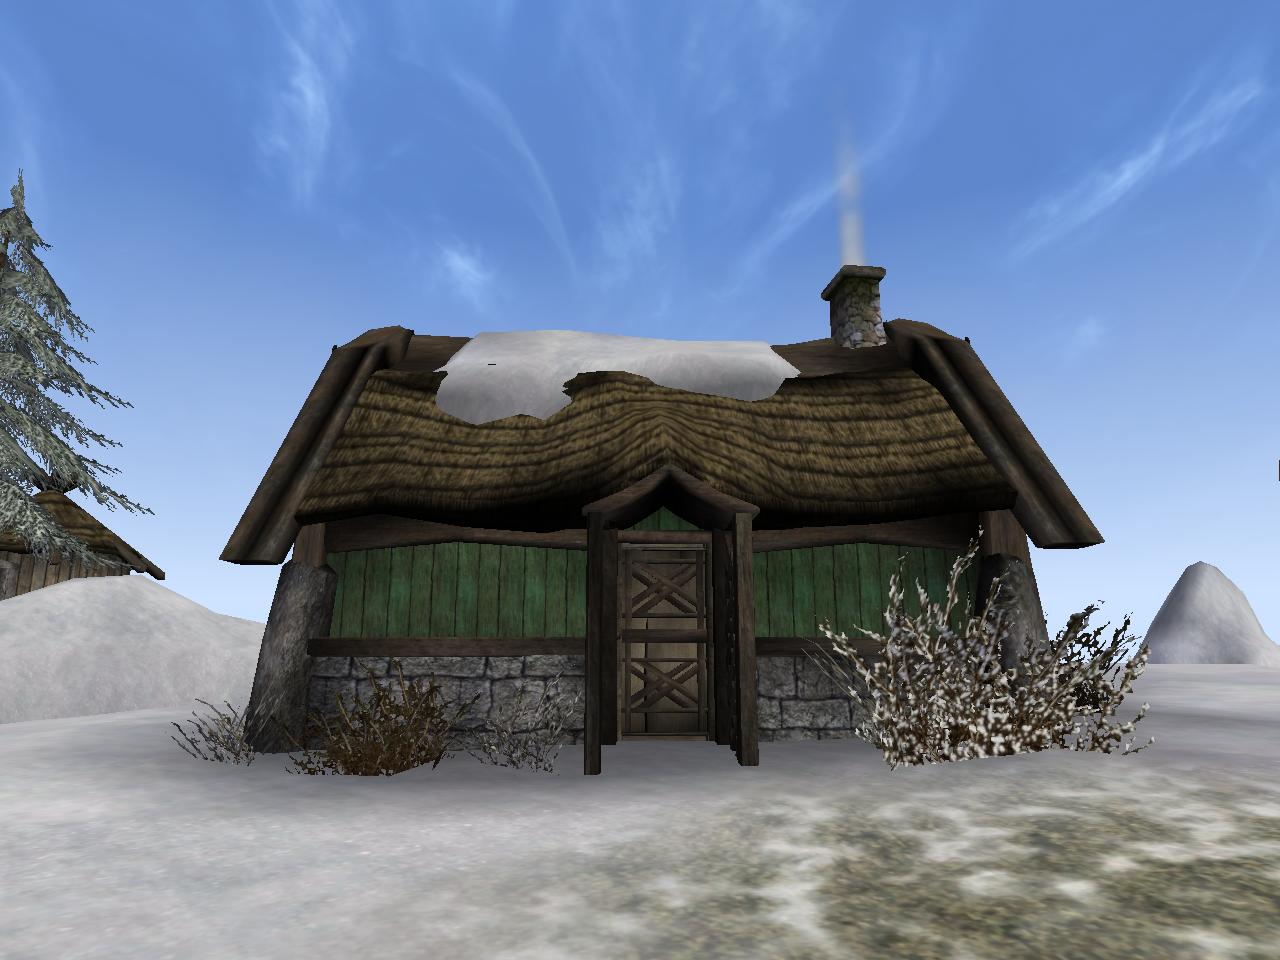 Bronrod the Roarer's House